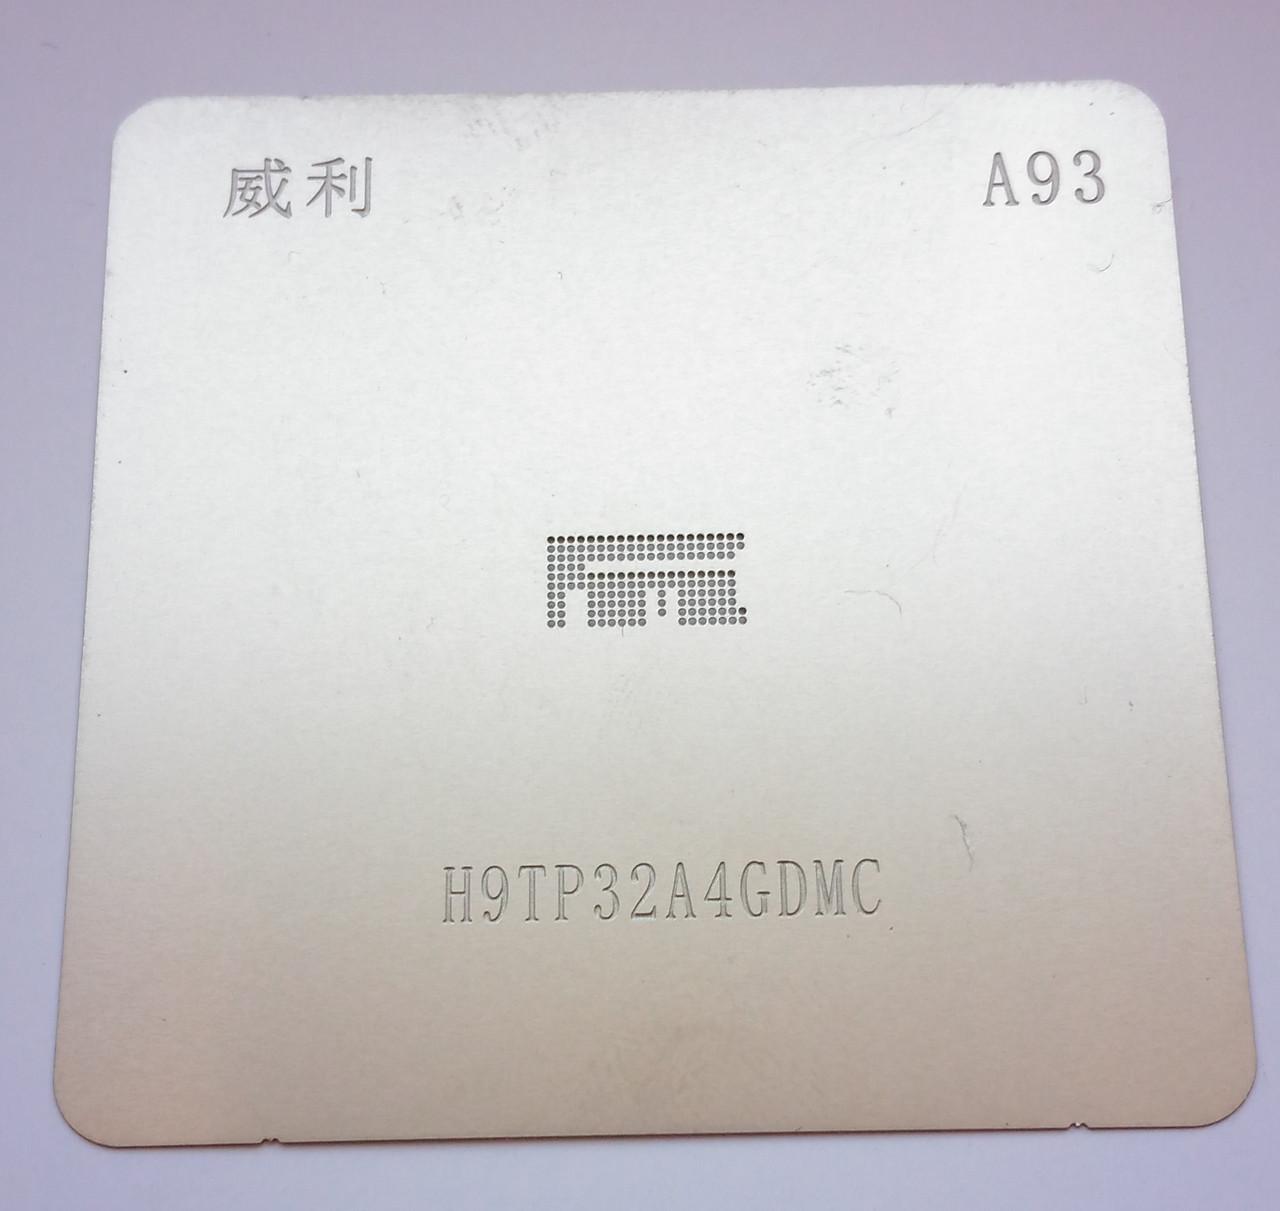 Трафарет флэш-памяти eMMC H9TP32A4GDMC BGA 162